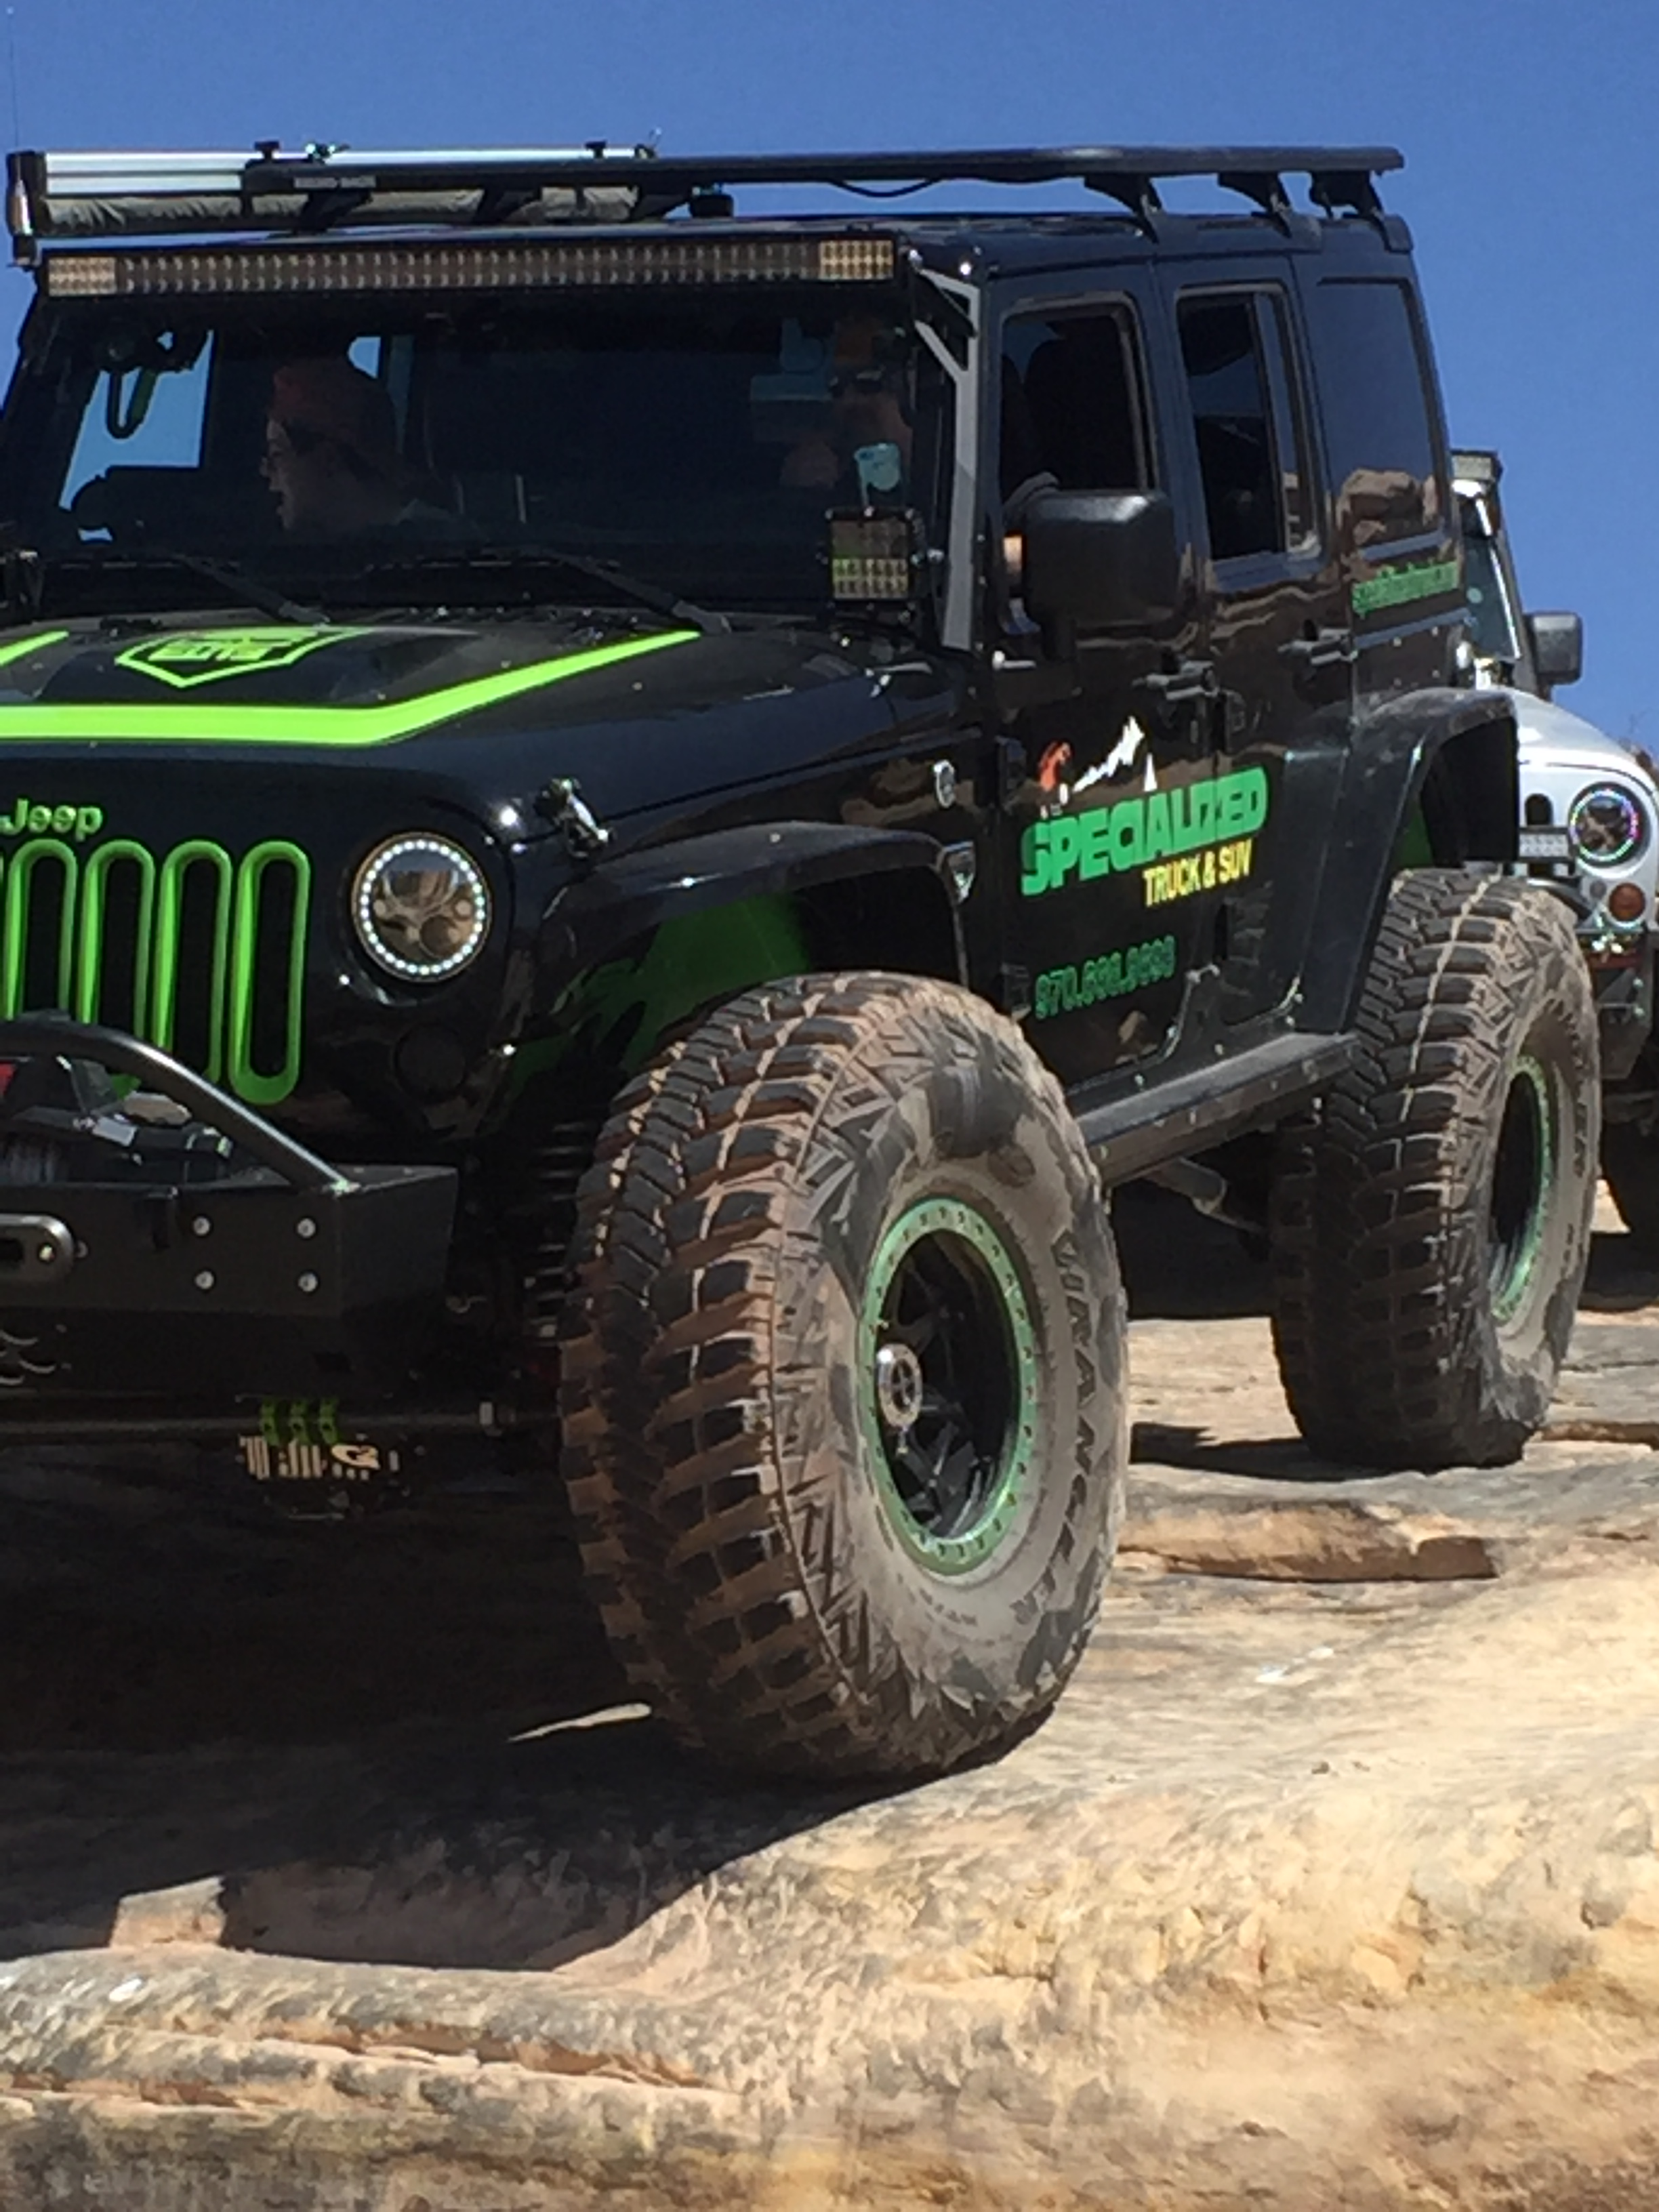 Jeep Safari_01.JPG